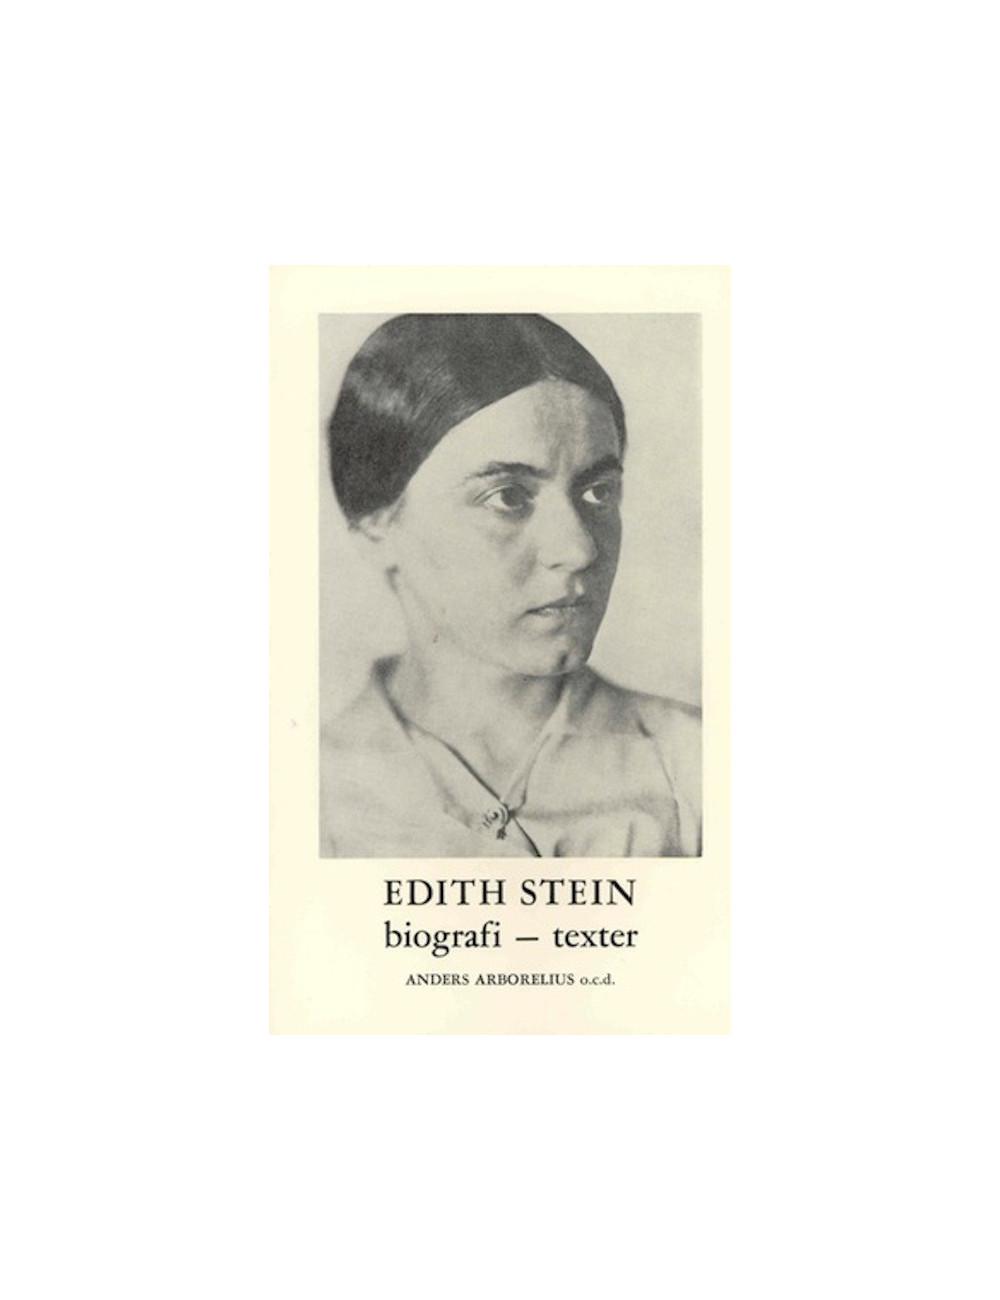 Edith Stein, biografi - texter